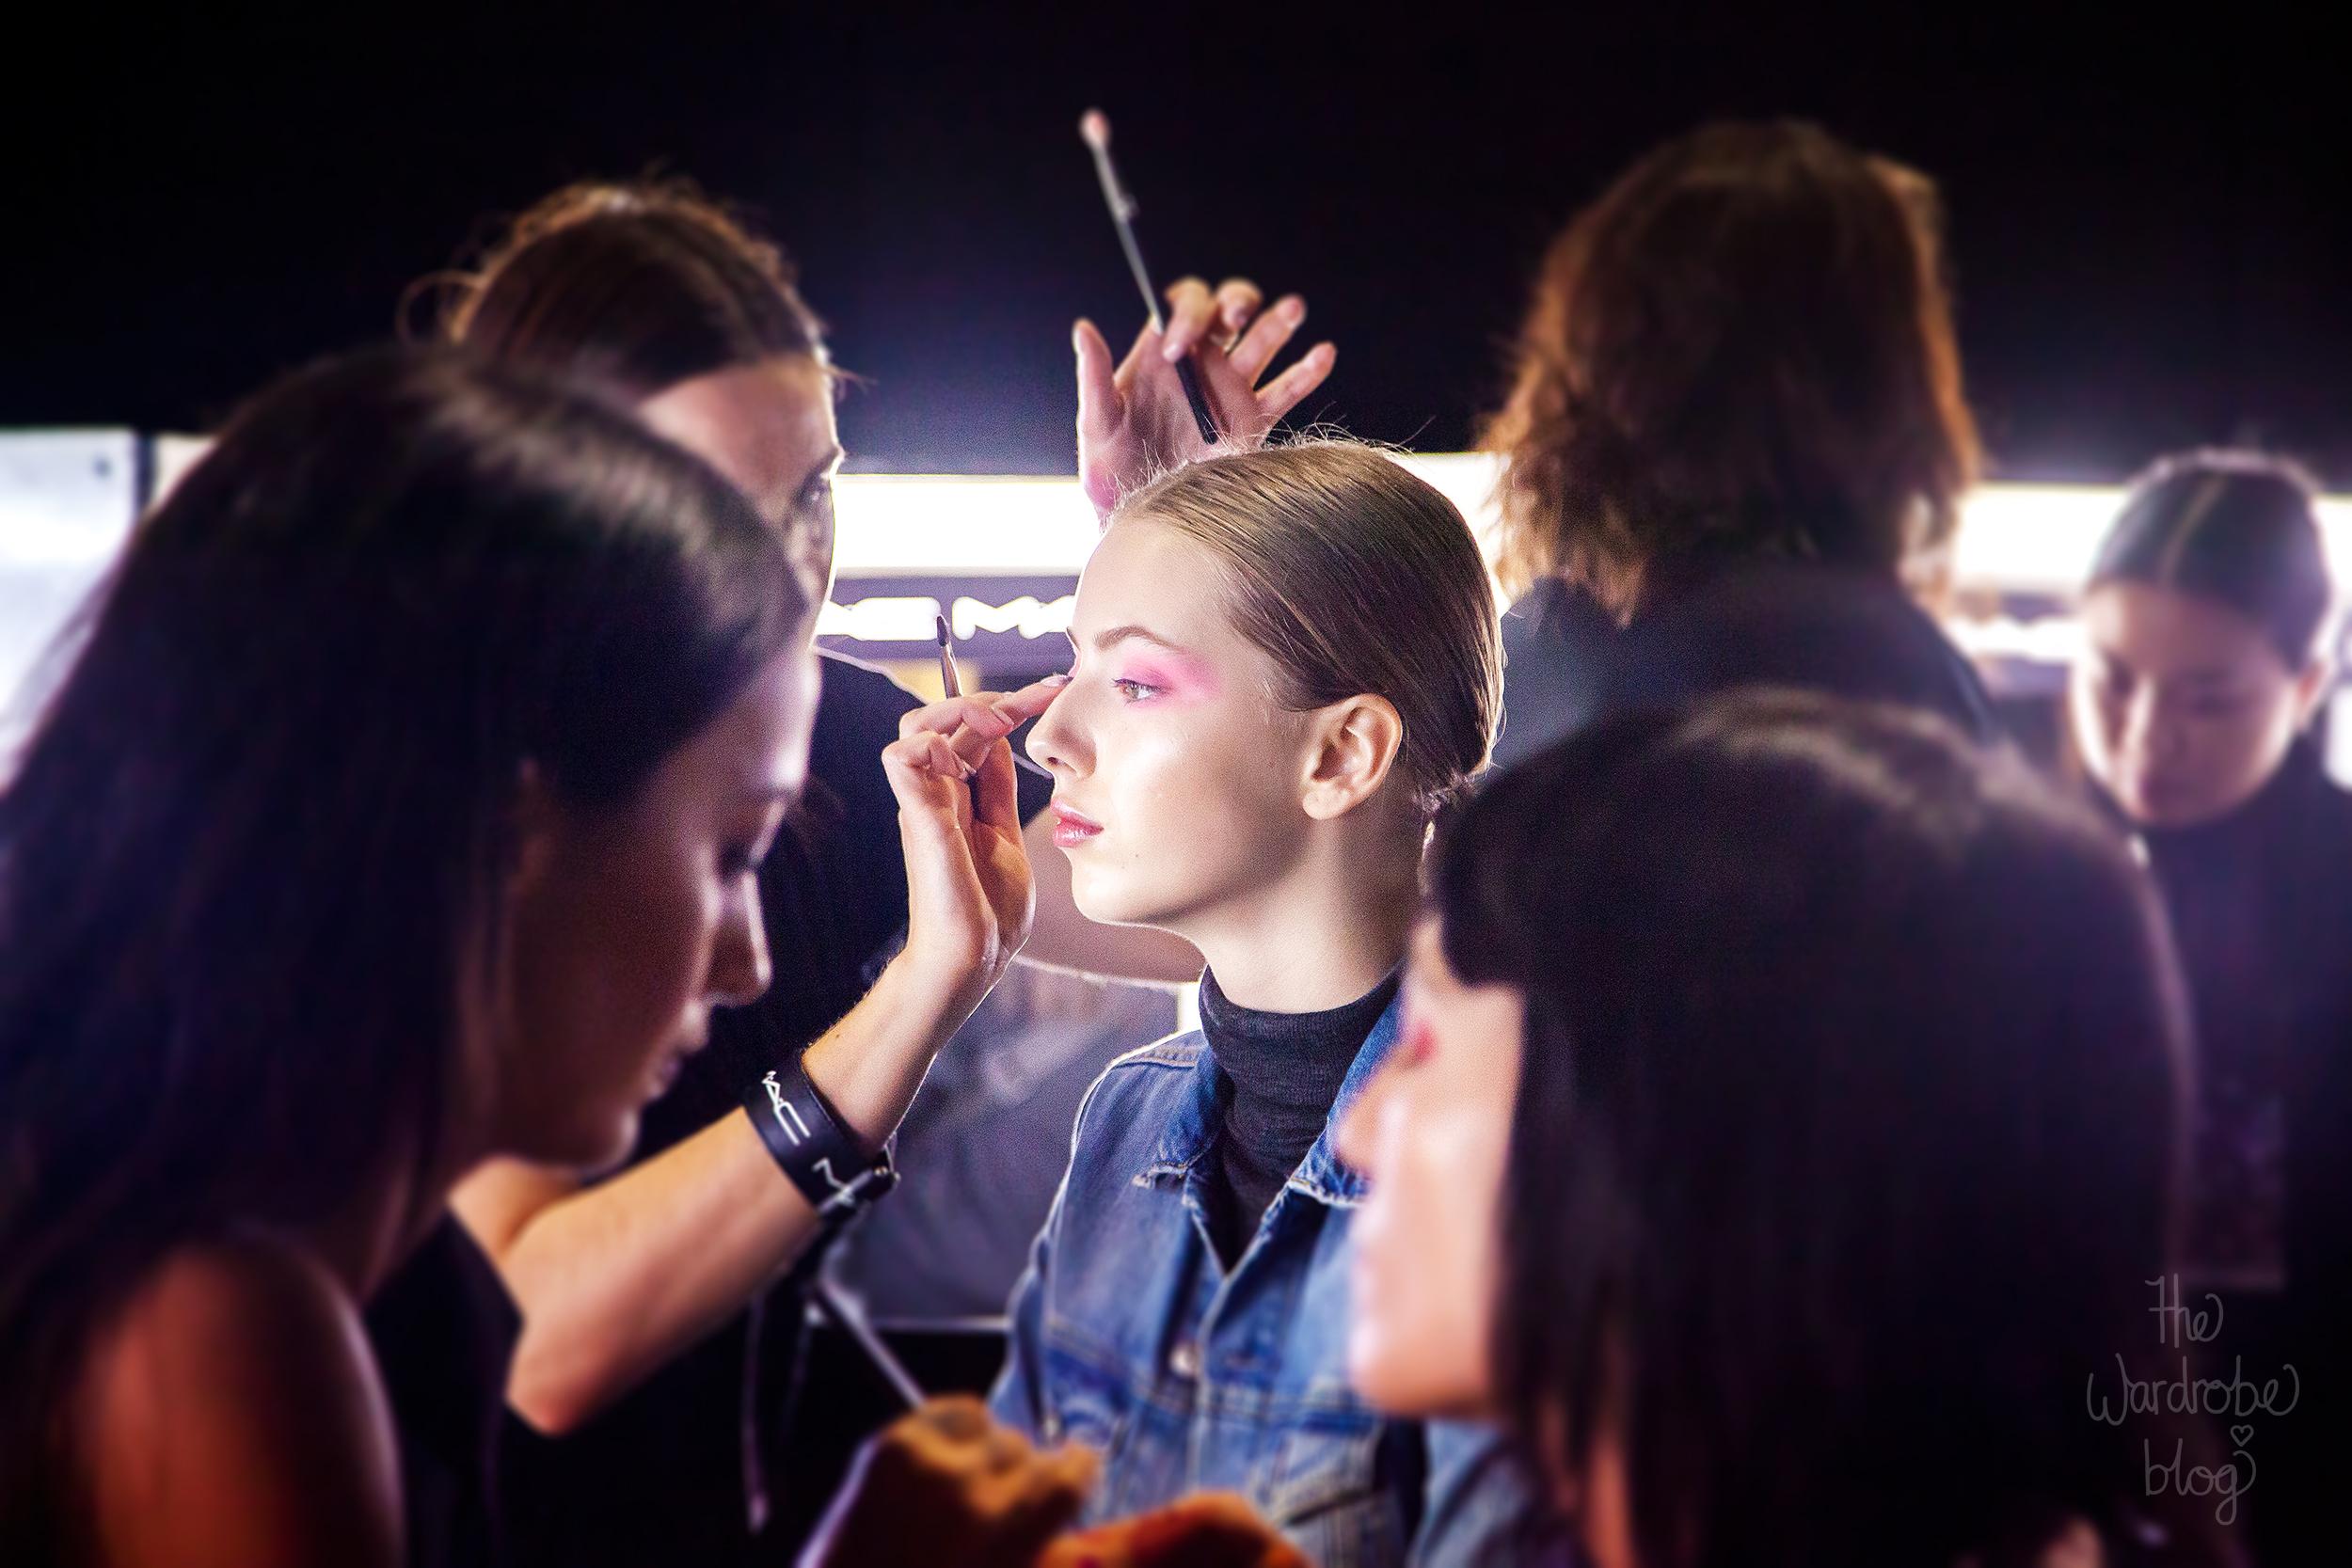 Kate-Sylvester-Backstage-Makeup-NZFW